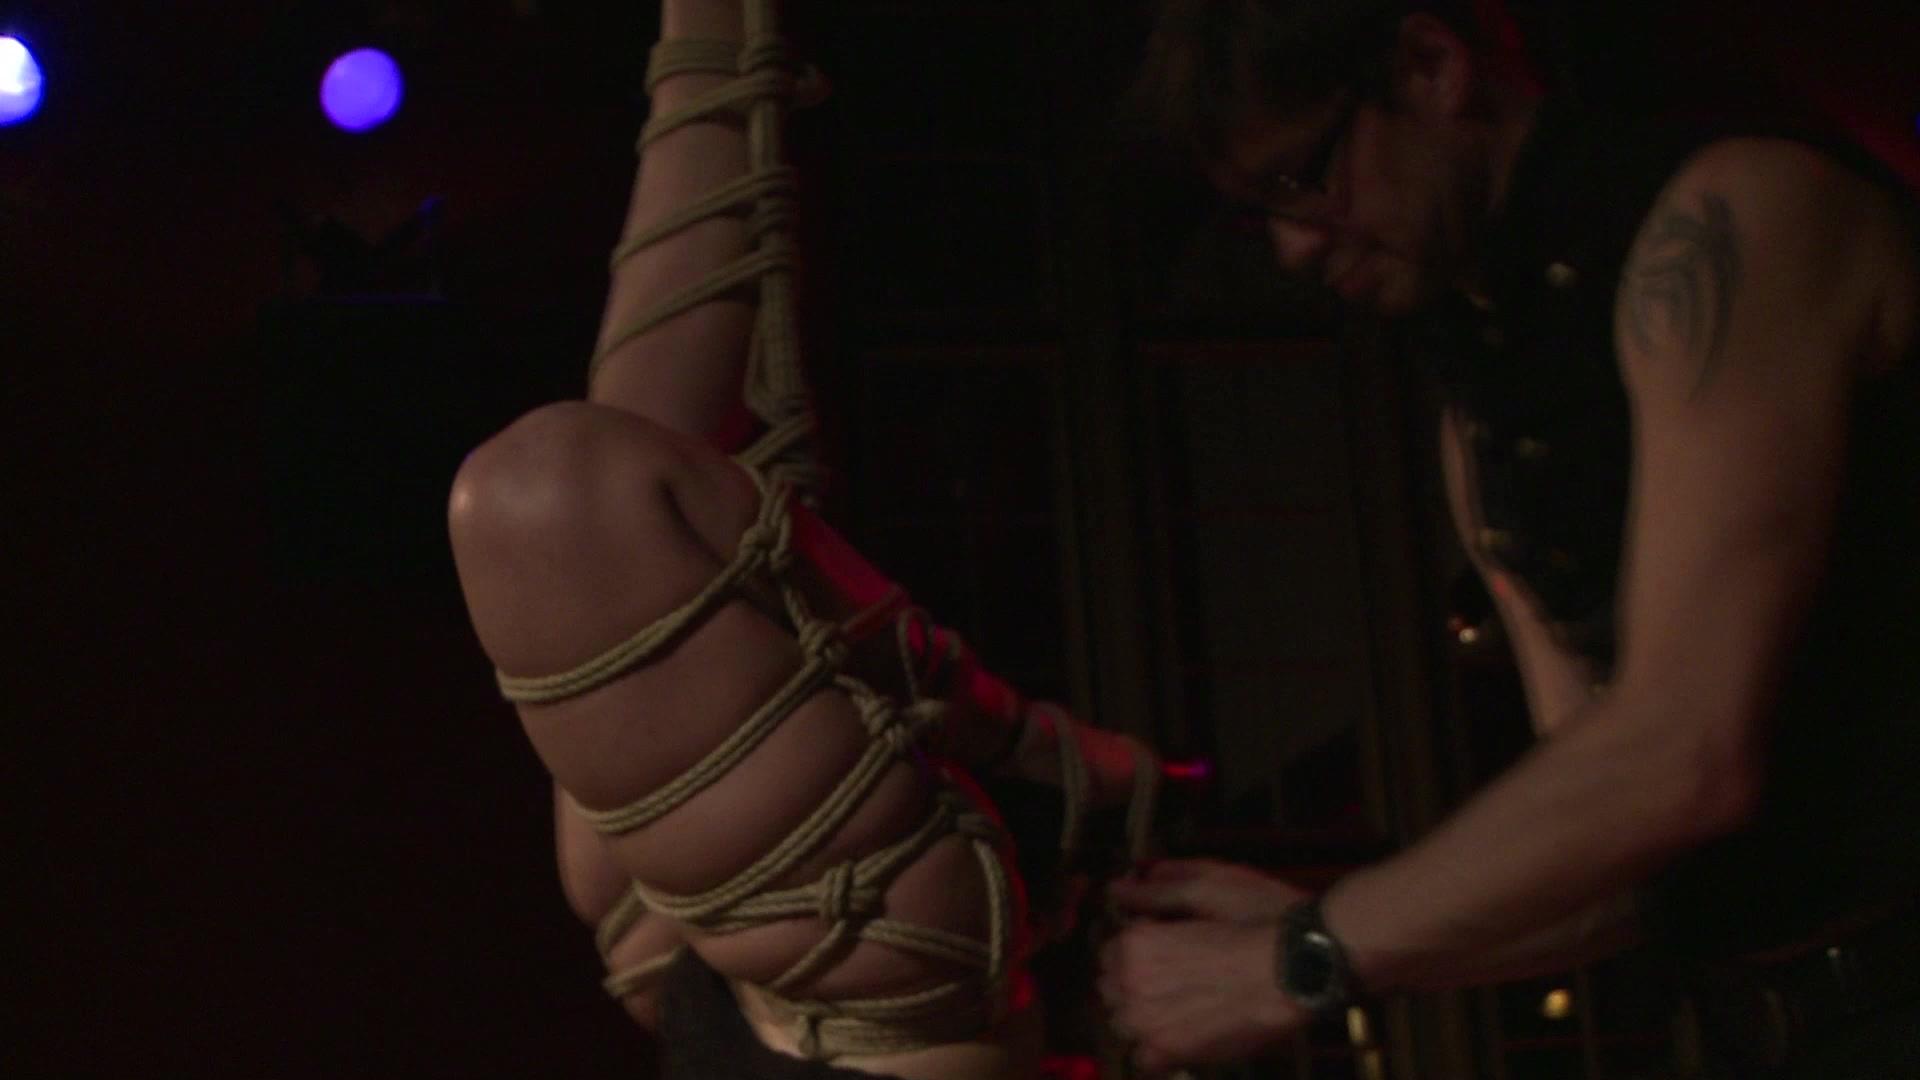 tango frisør live porn chat